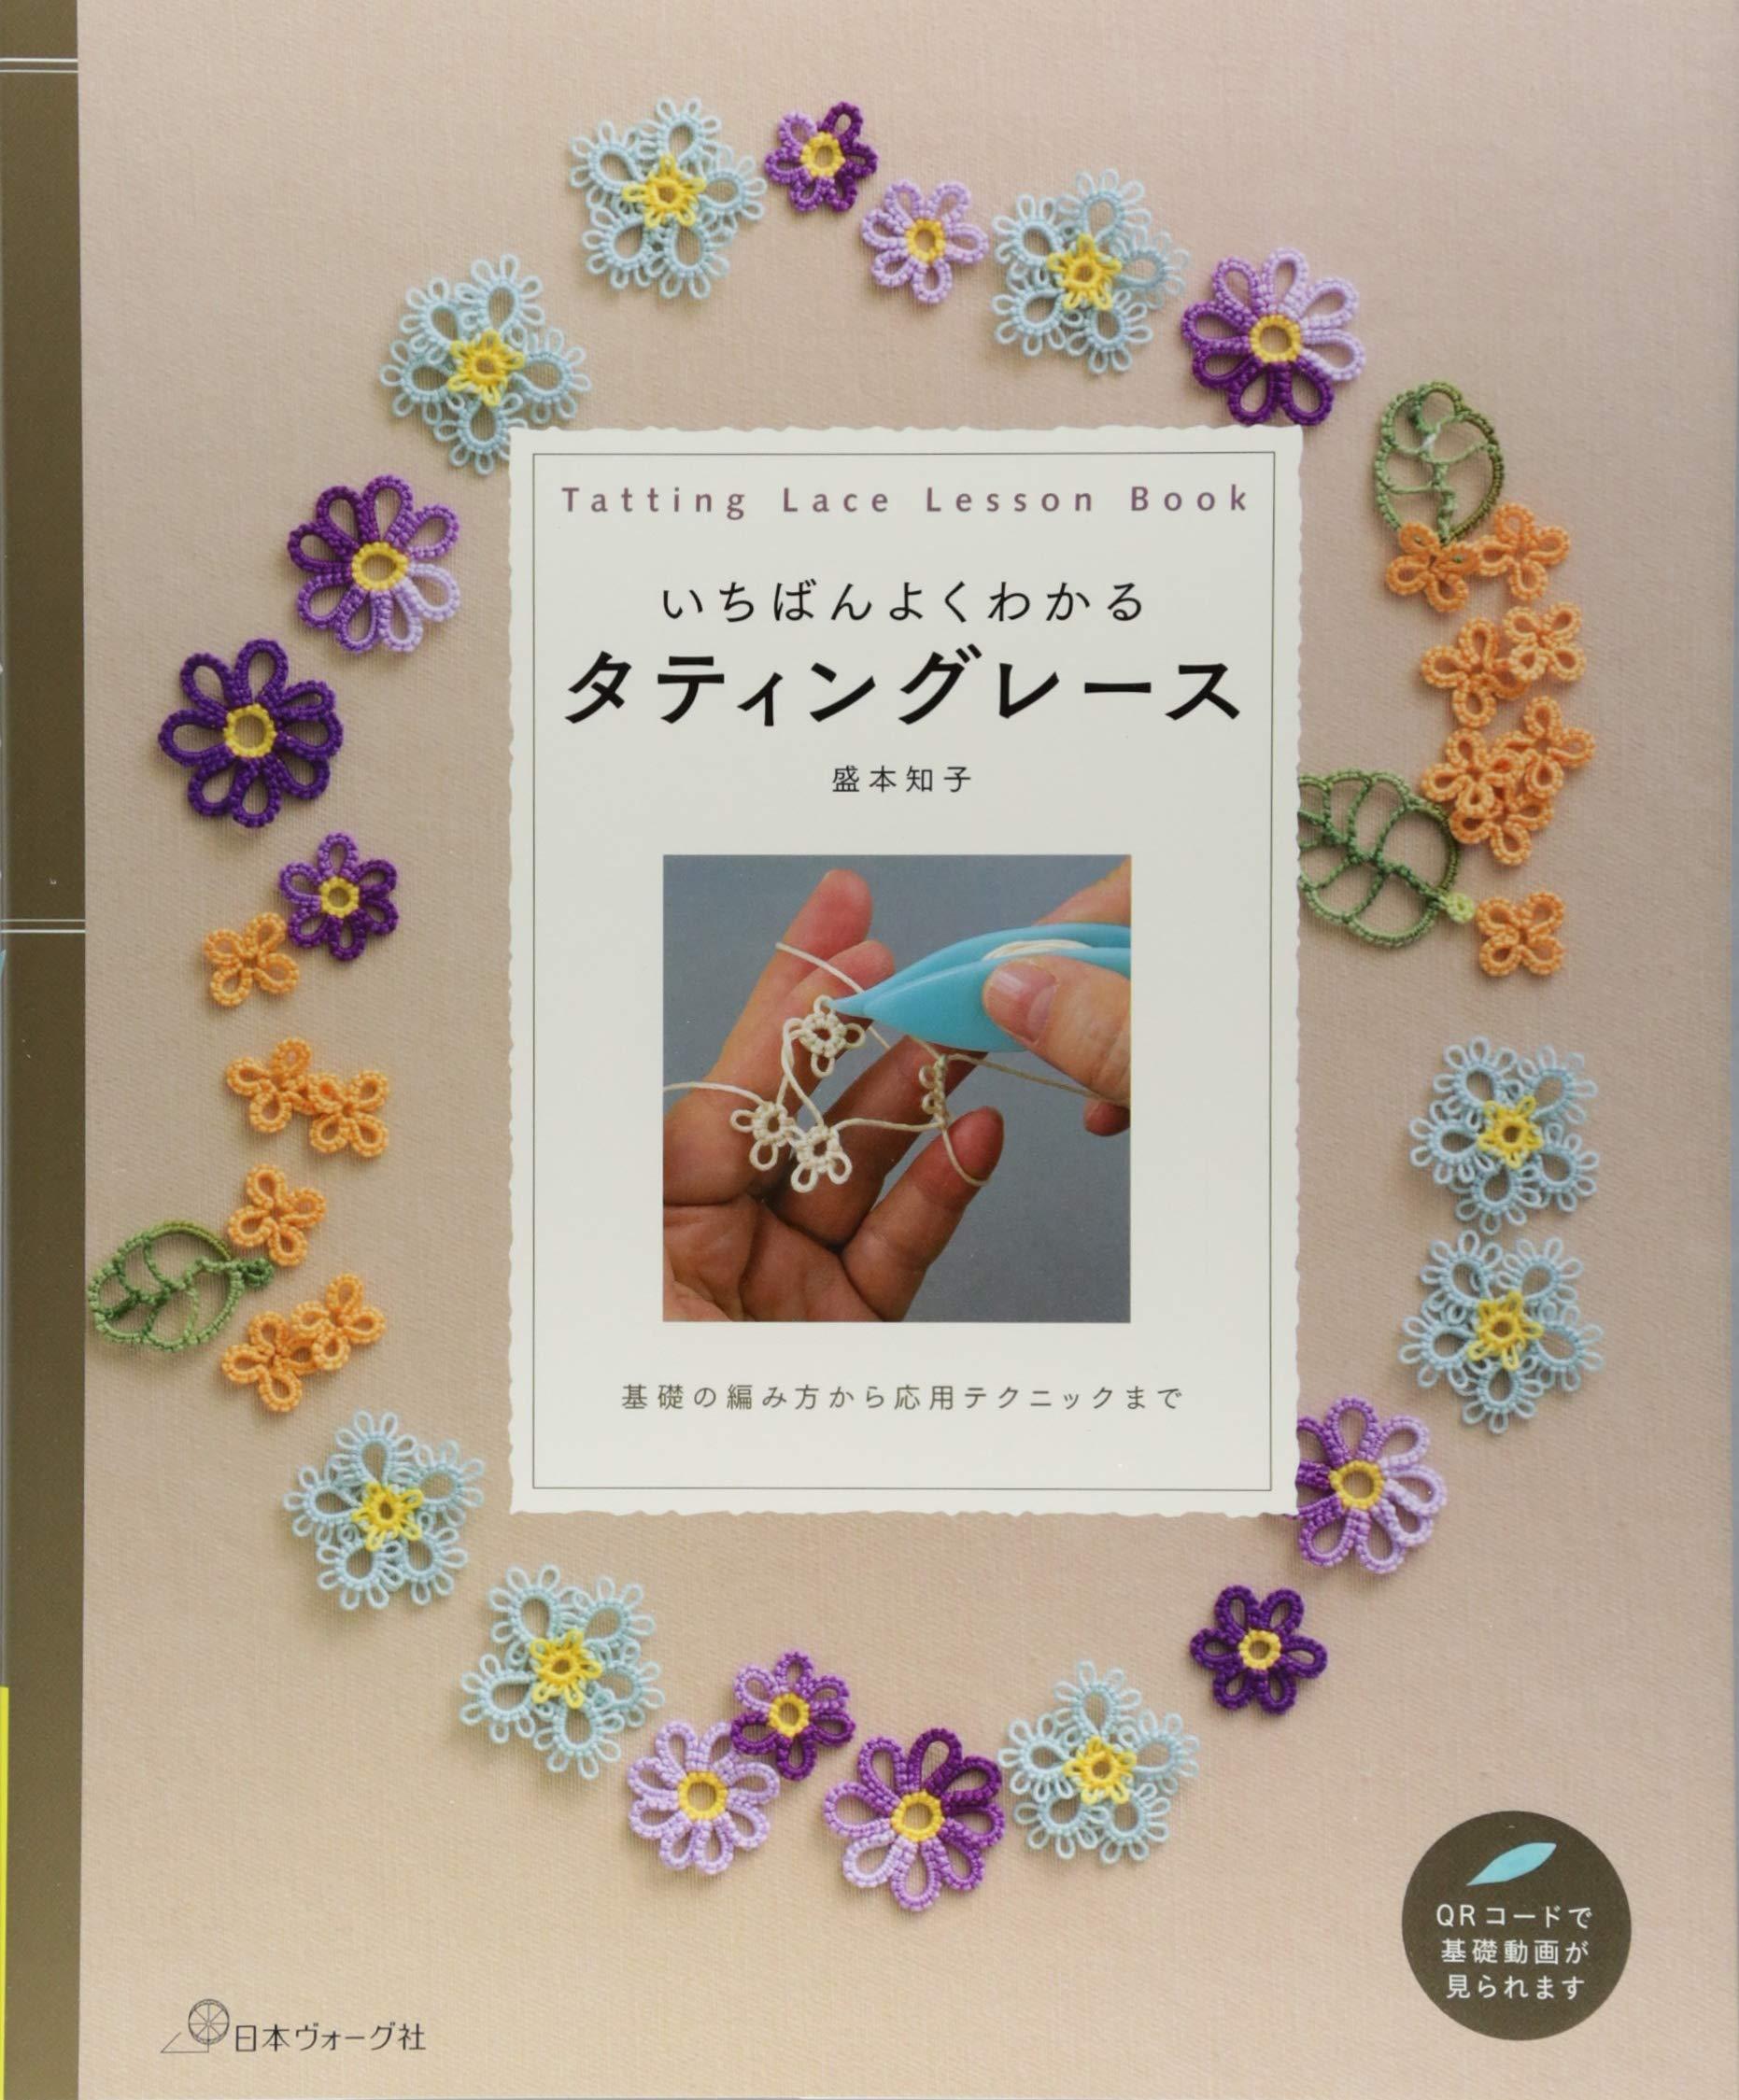 Tatting lace book best understood